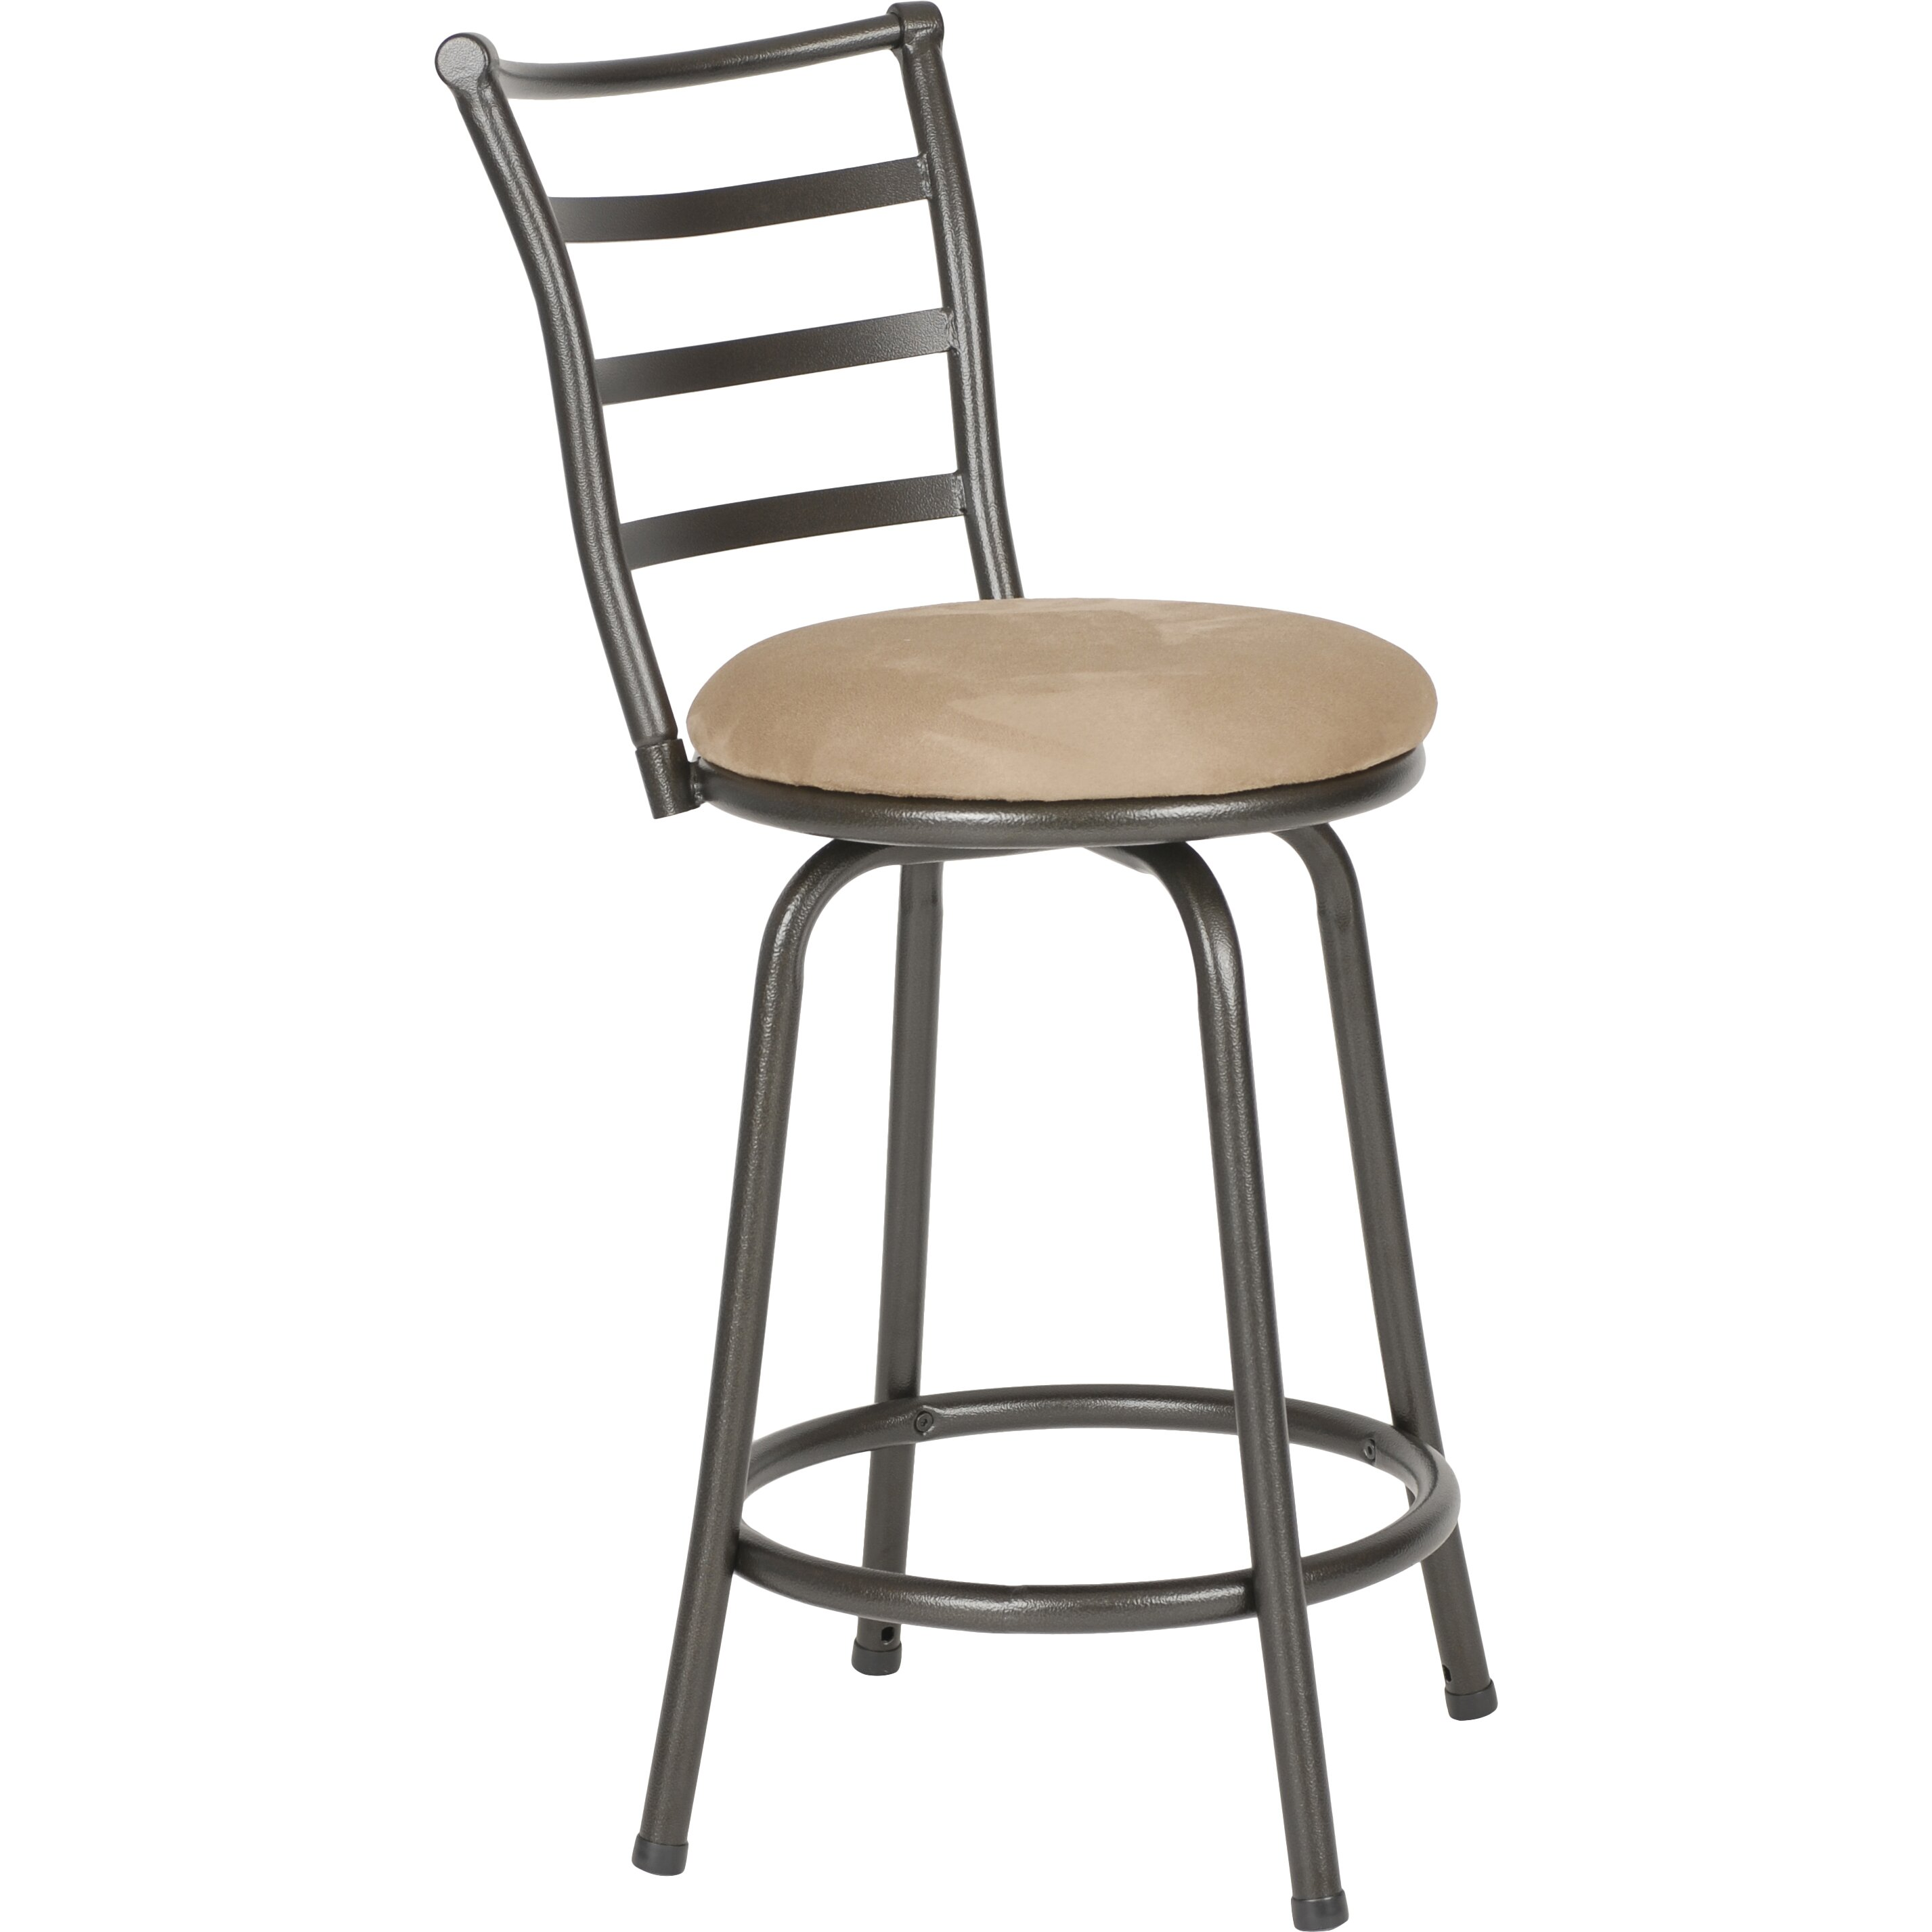 Roundhill Furniture Swivel Bar Stool Reviews Wayfair